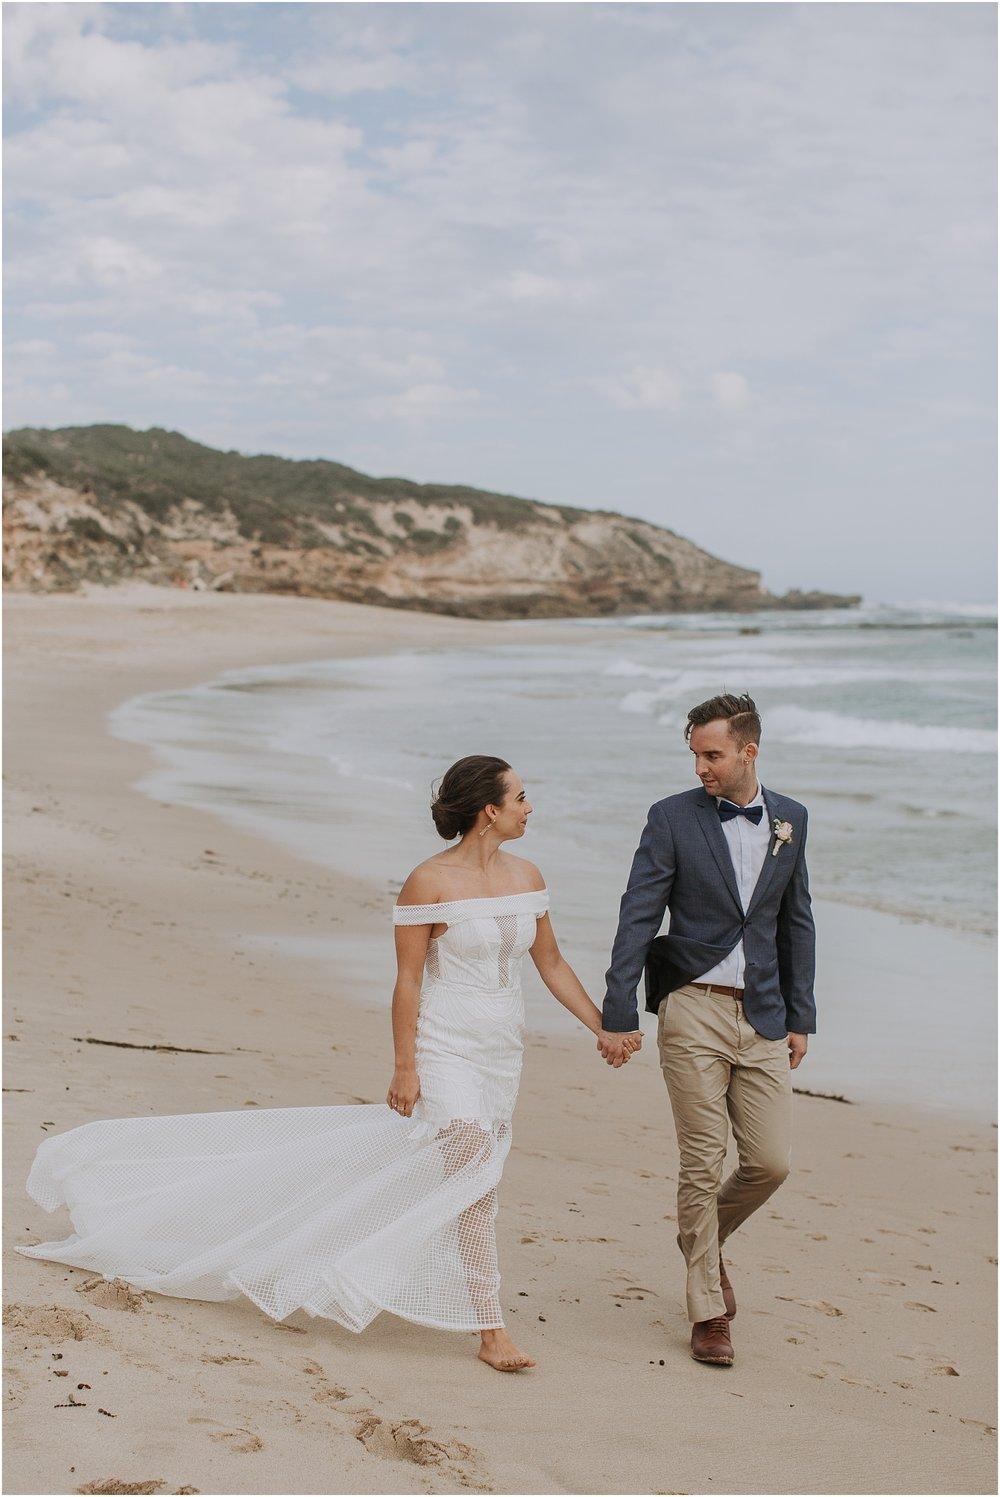 Kali and Simon's beach wedding at The Baths Sorrento on the Mornington Peninsula._0085.jpg